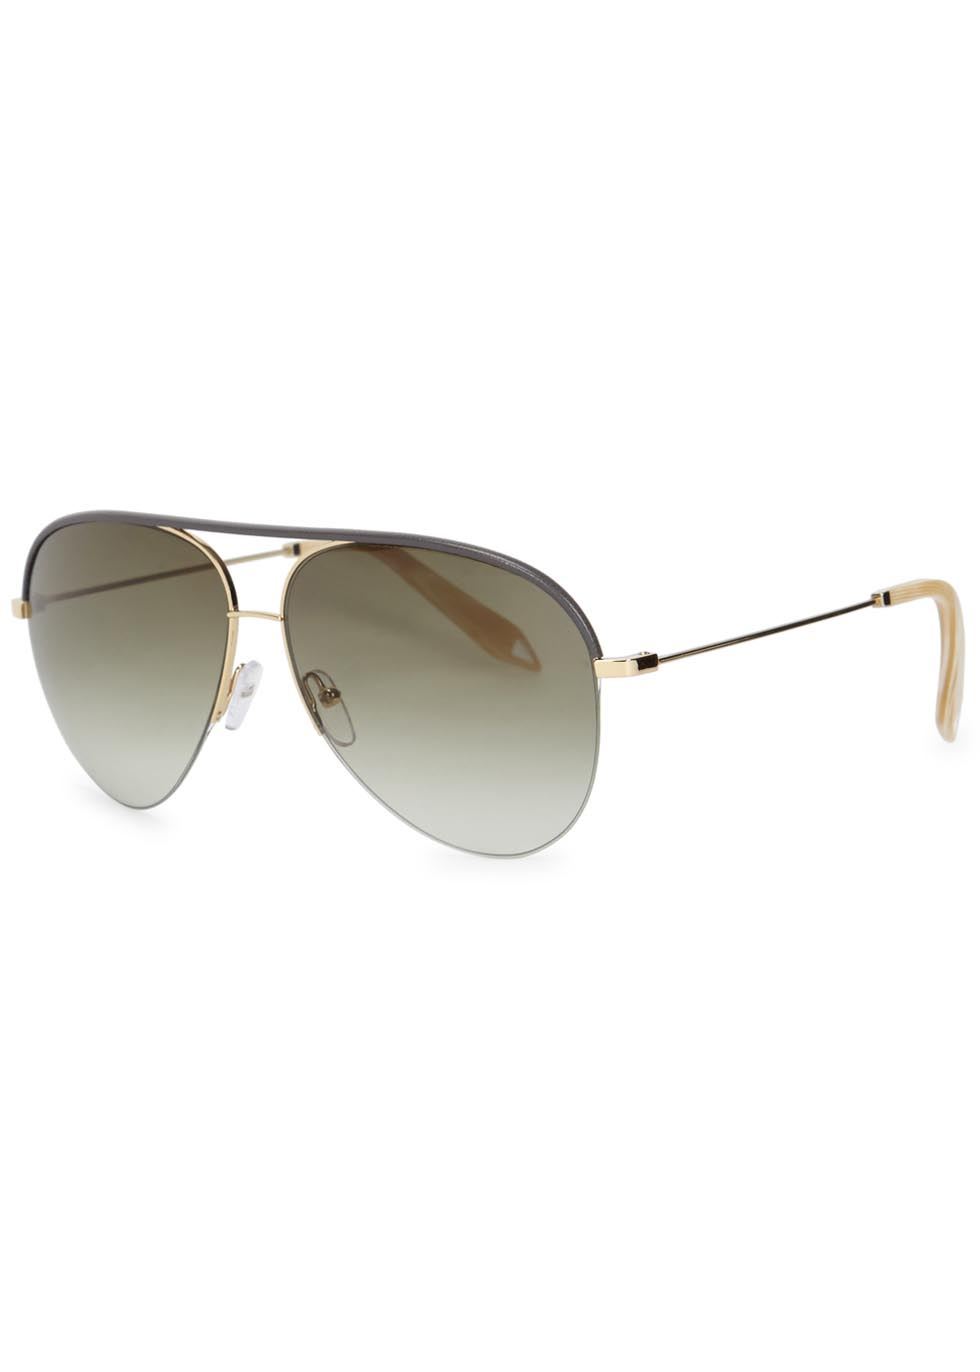 Classic Victoria gold tone aviator-style sunglasses - Victoria Beckham